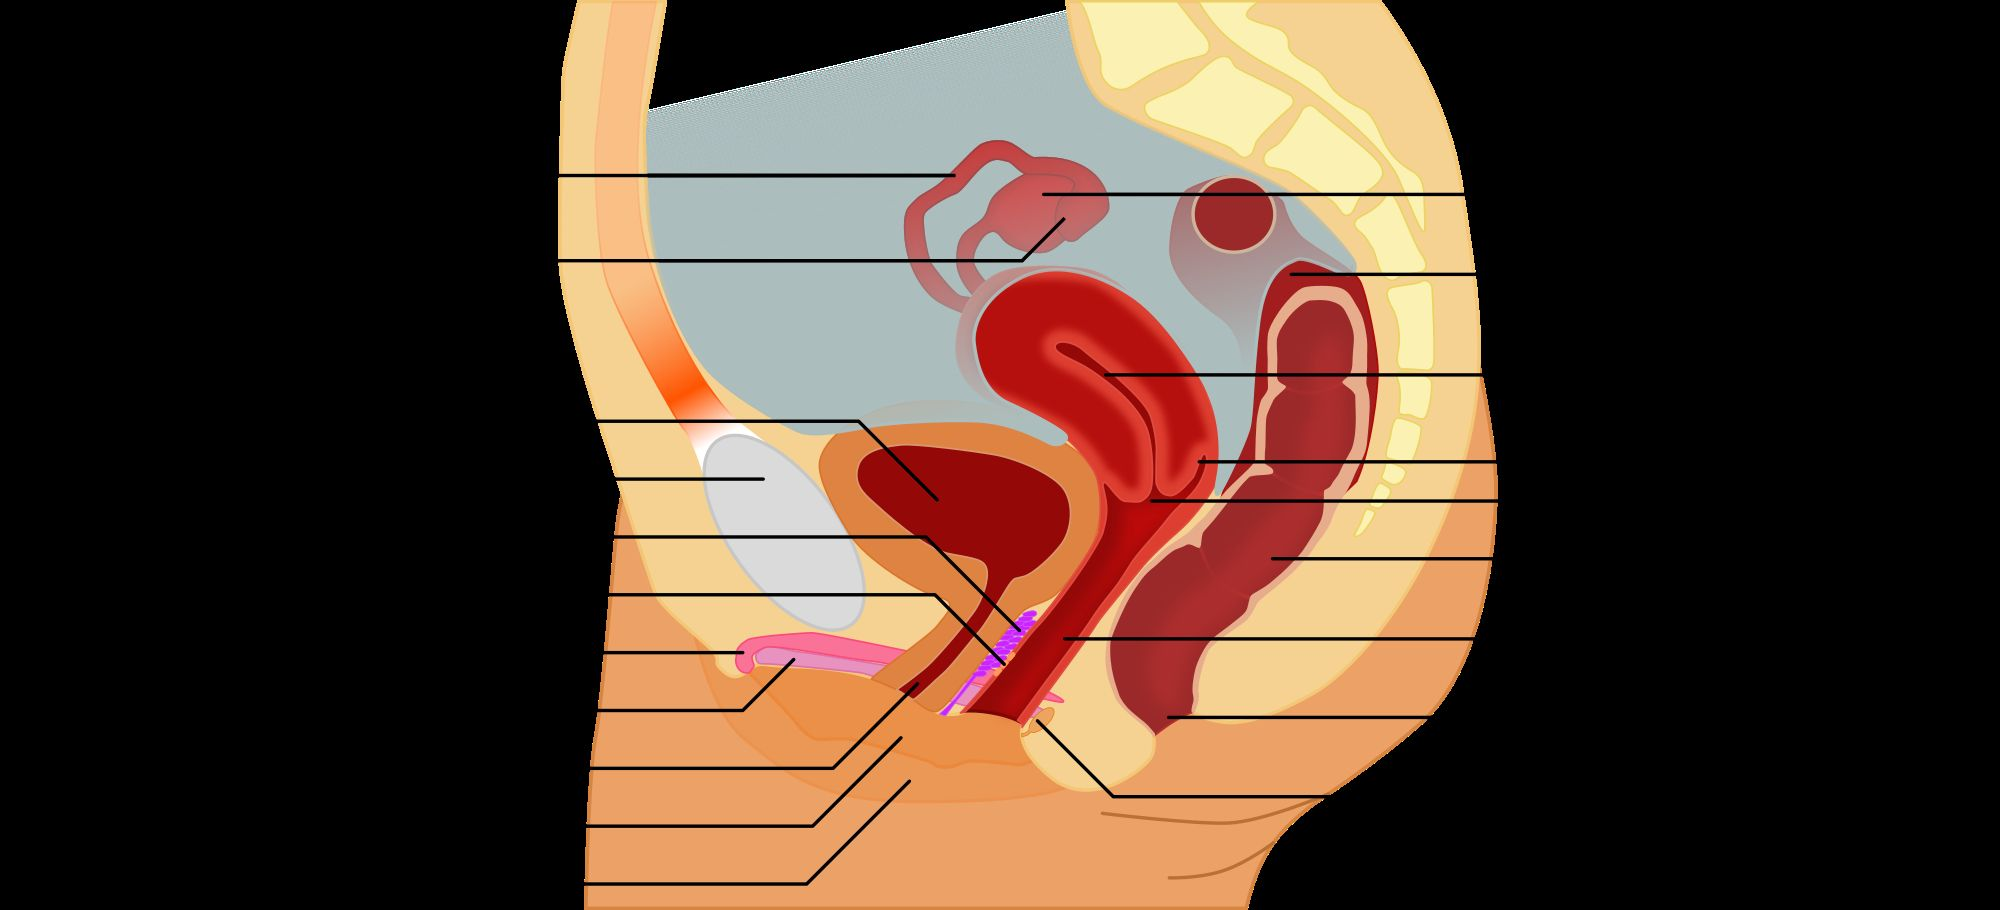 Diagram Female Anatomy Koibana Info Human Anatomy Picture Female Anatomy Human Body Anatomy